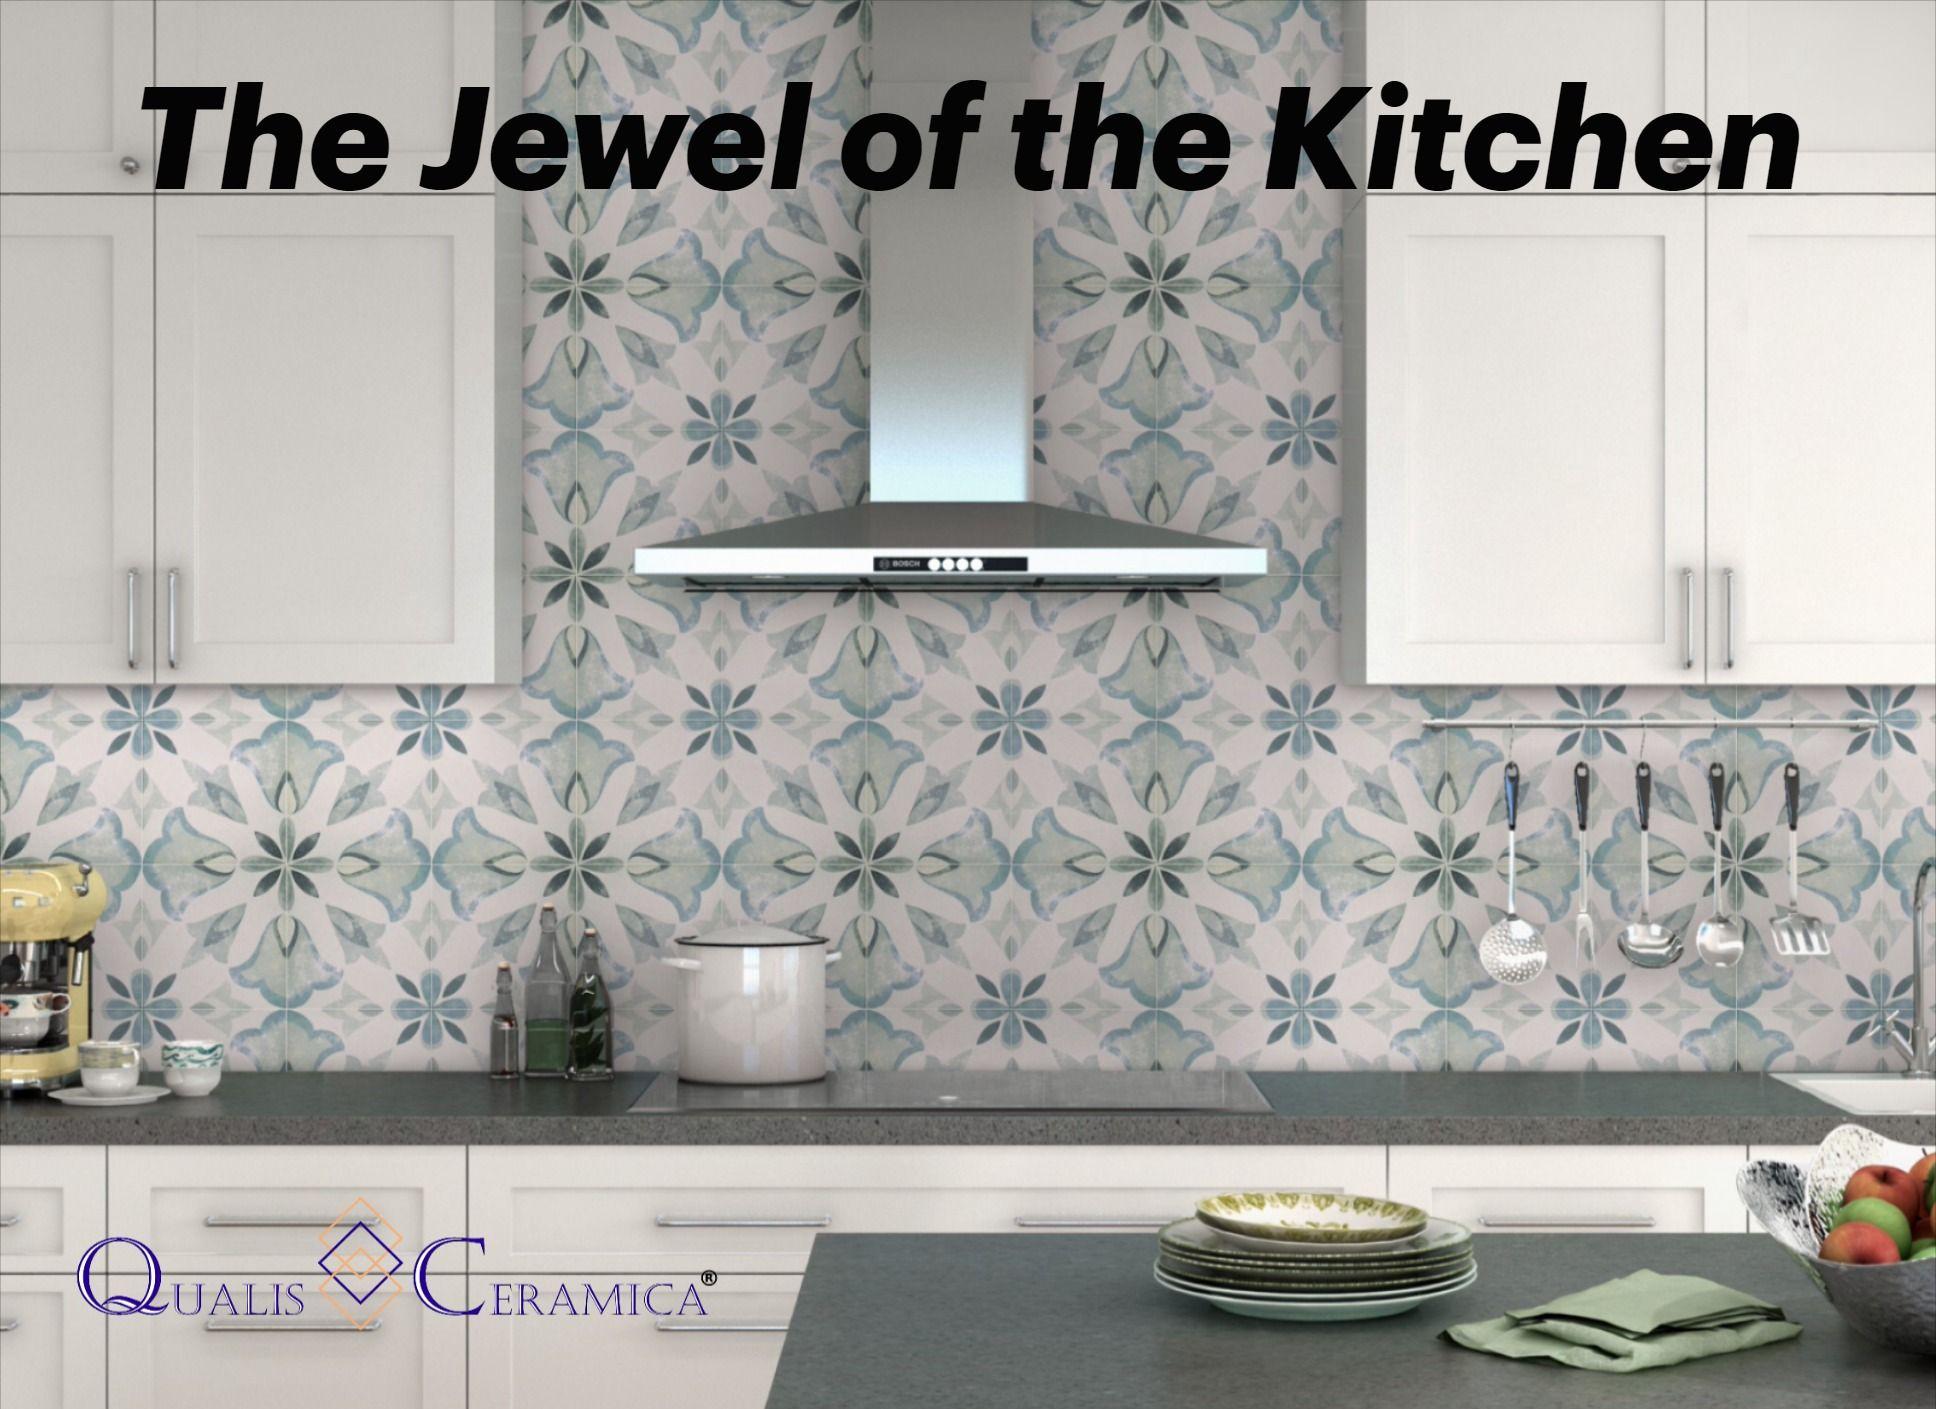 Kitchen Backsplash Tile Ideas Qualis Ceramica Tapestry Lisbon 9x9 Porcelain Cement Look Shower Wall Tile Kitchen Tiles Backsplash Unique Tile